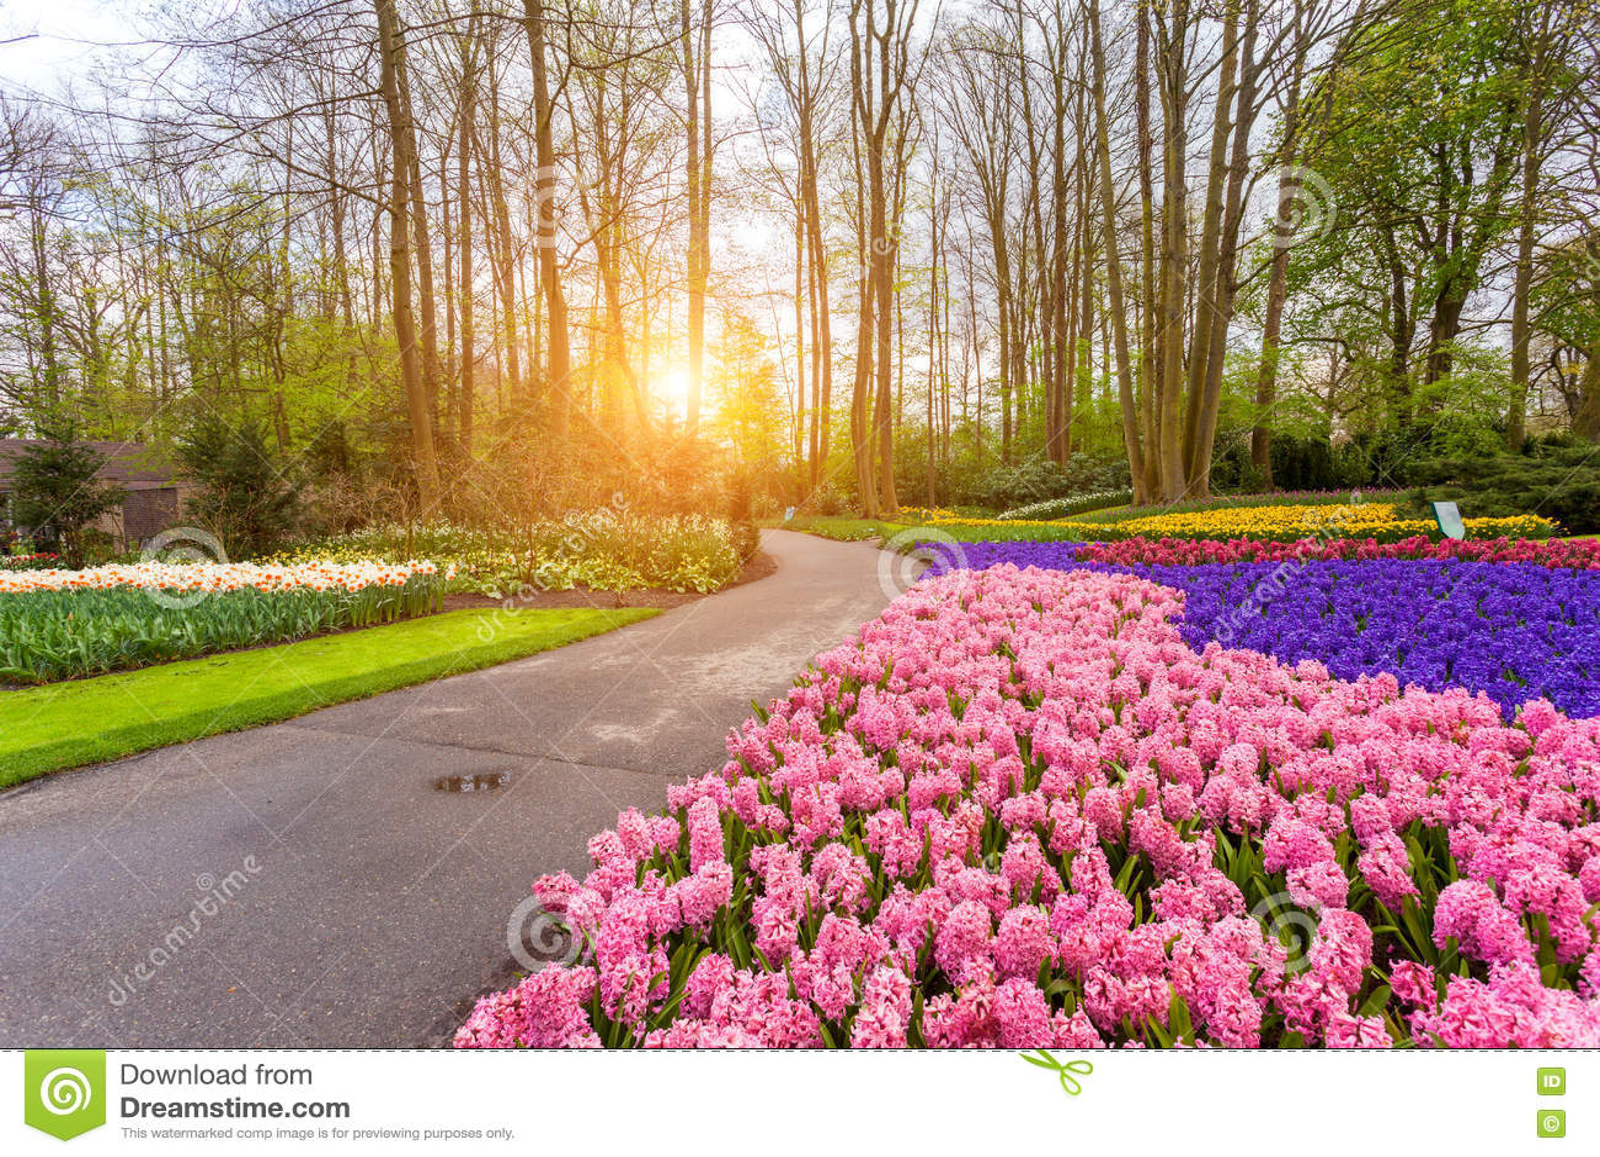 Beautiful Blooming Flowers At Sunset In Keukenhof Park In